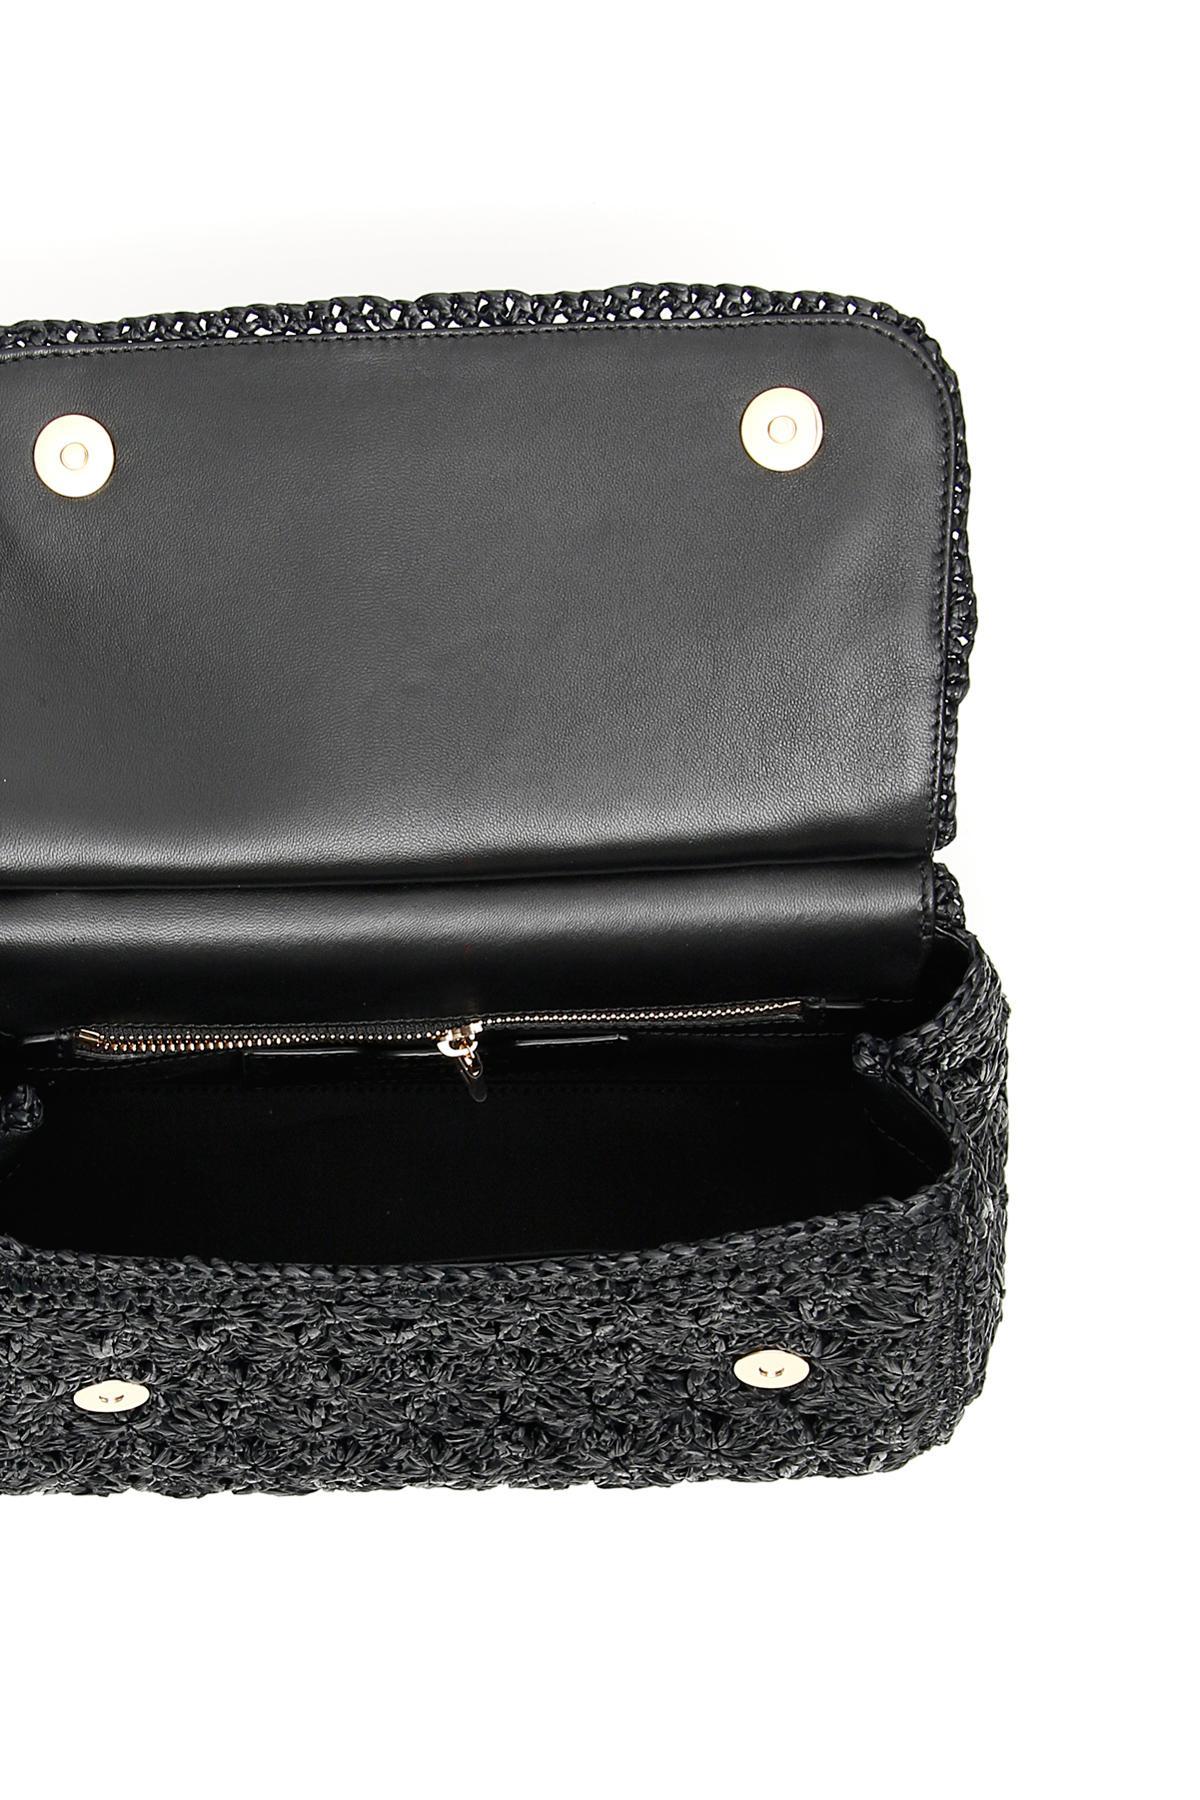 Dolce   Gabbana - Black Crochet Raffia Sicily Bag - Lyst. View fullscreen 3133c5d83be8d